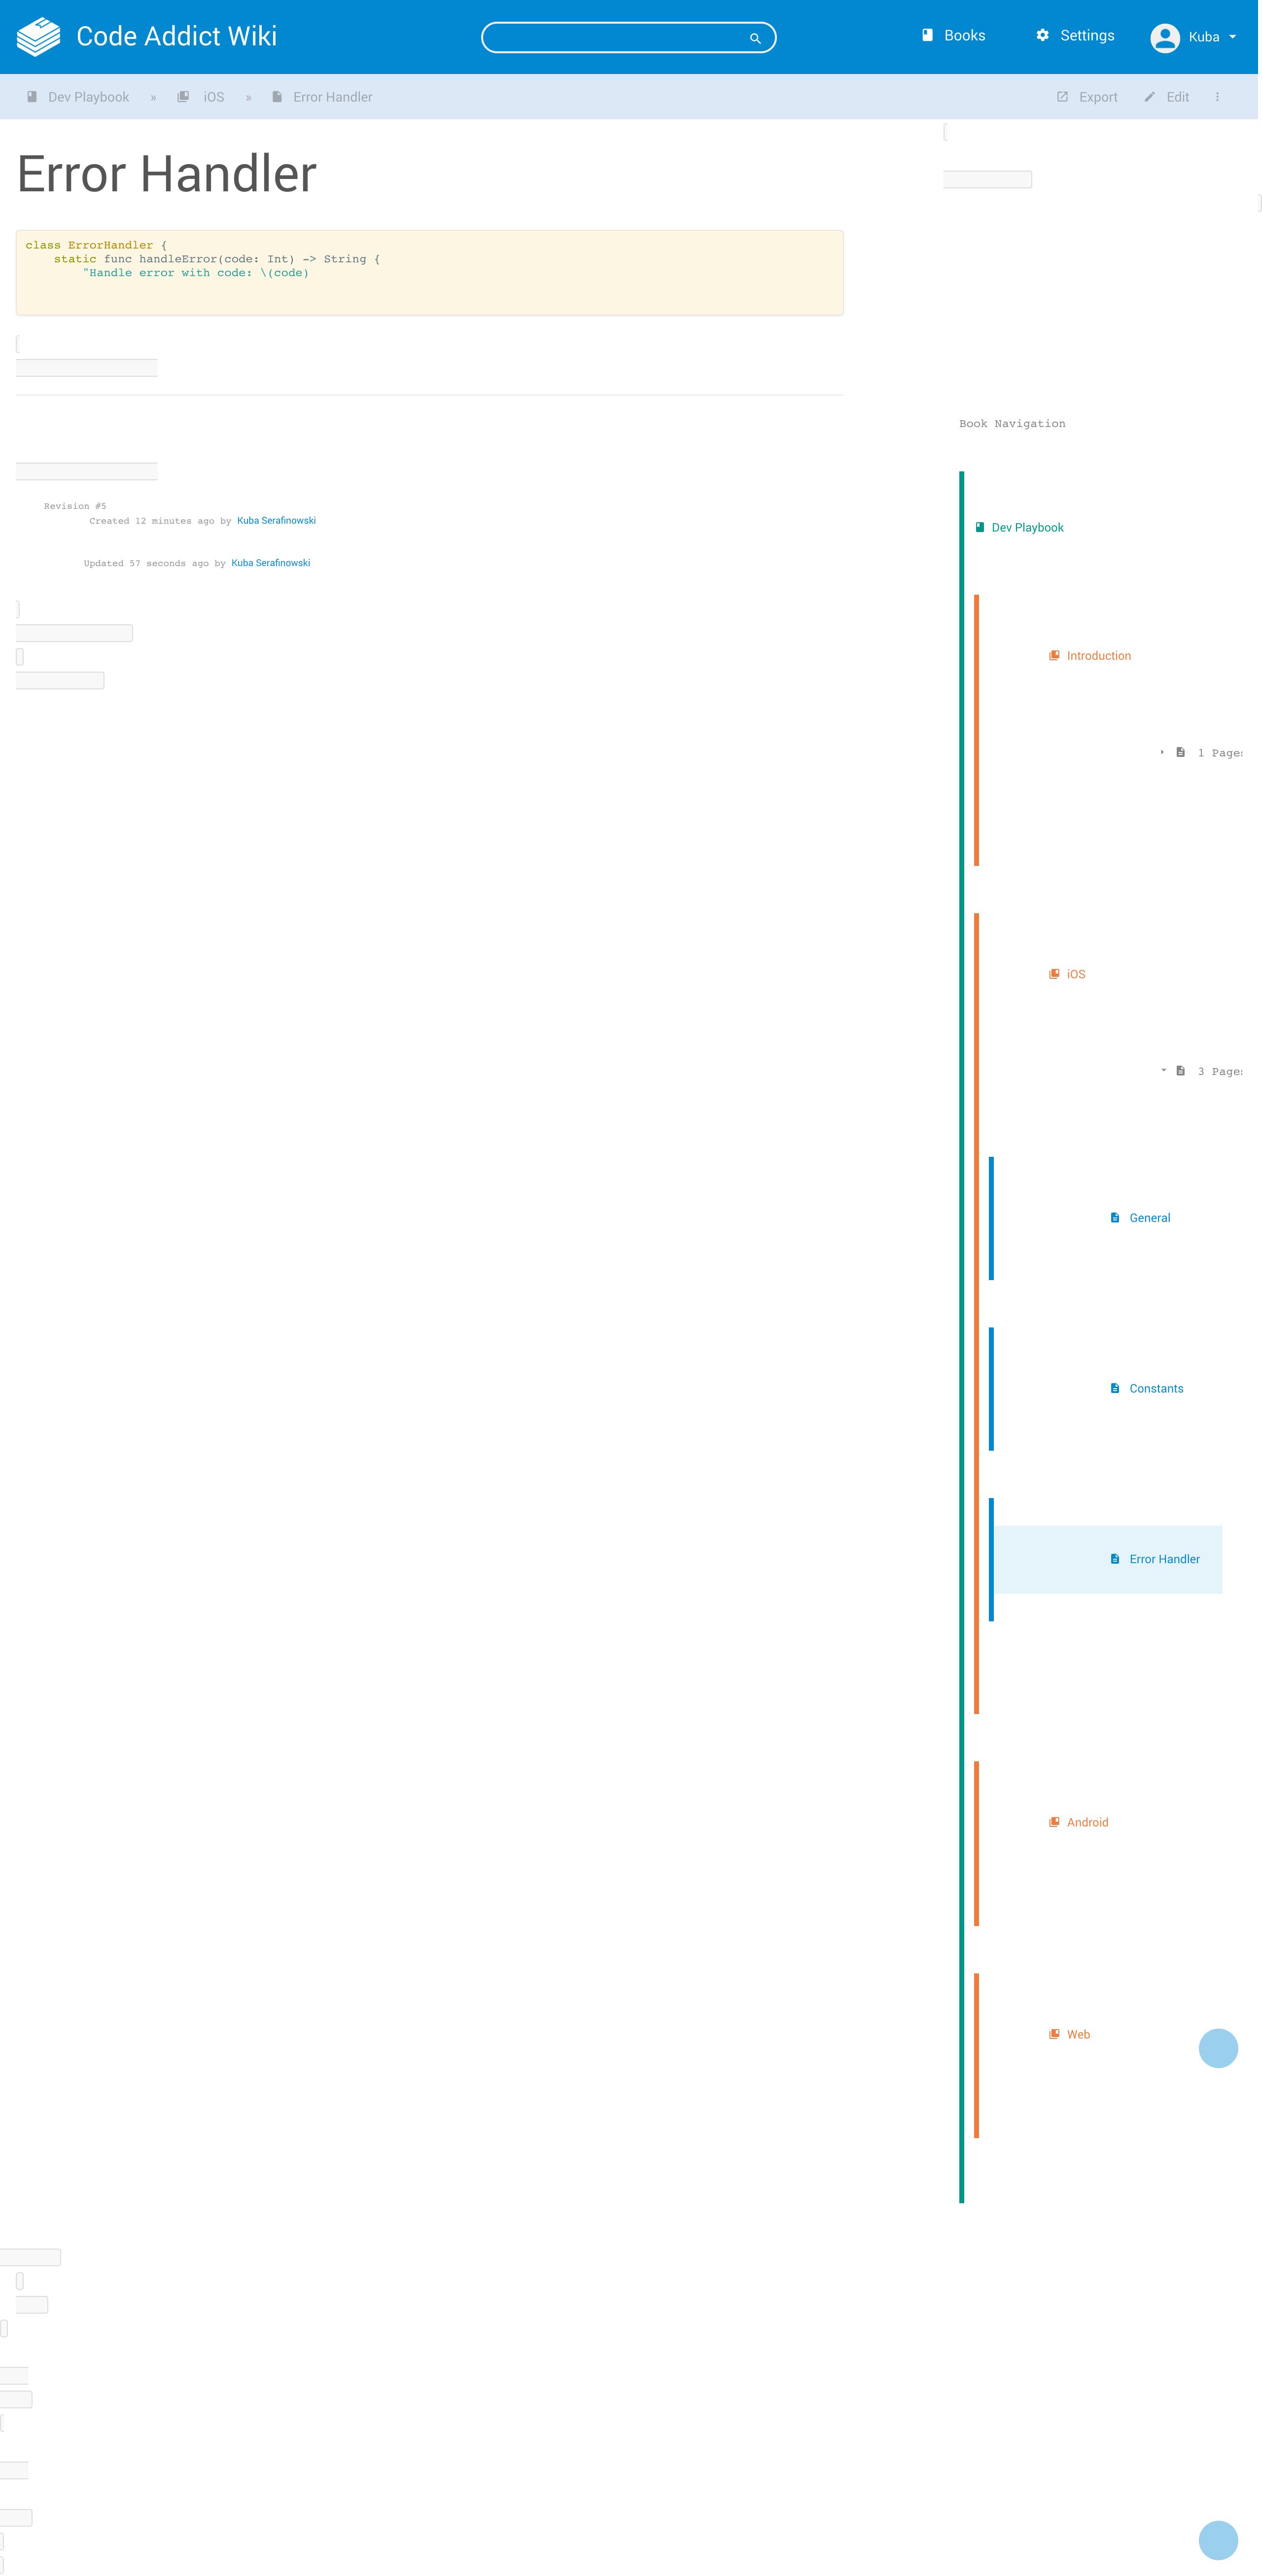 screencapture-wiki-codeaddict-io-books-dev-playbook-page-error-handler-1496246314891